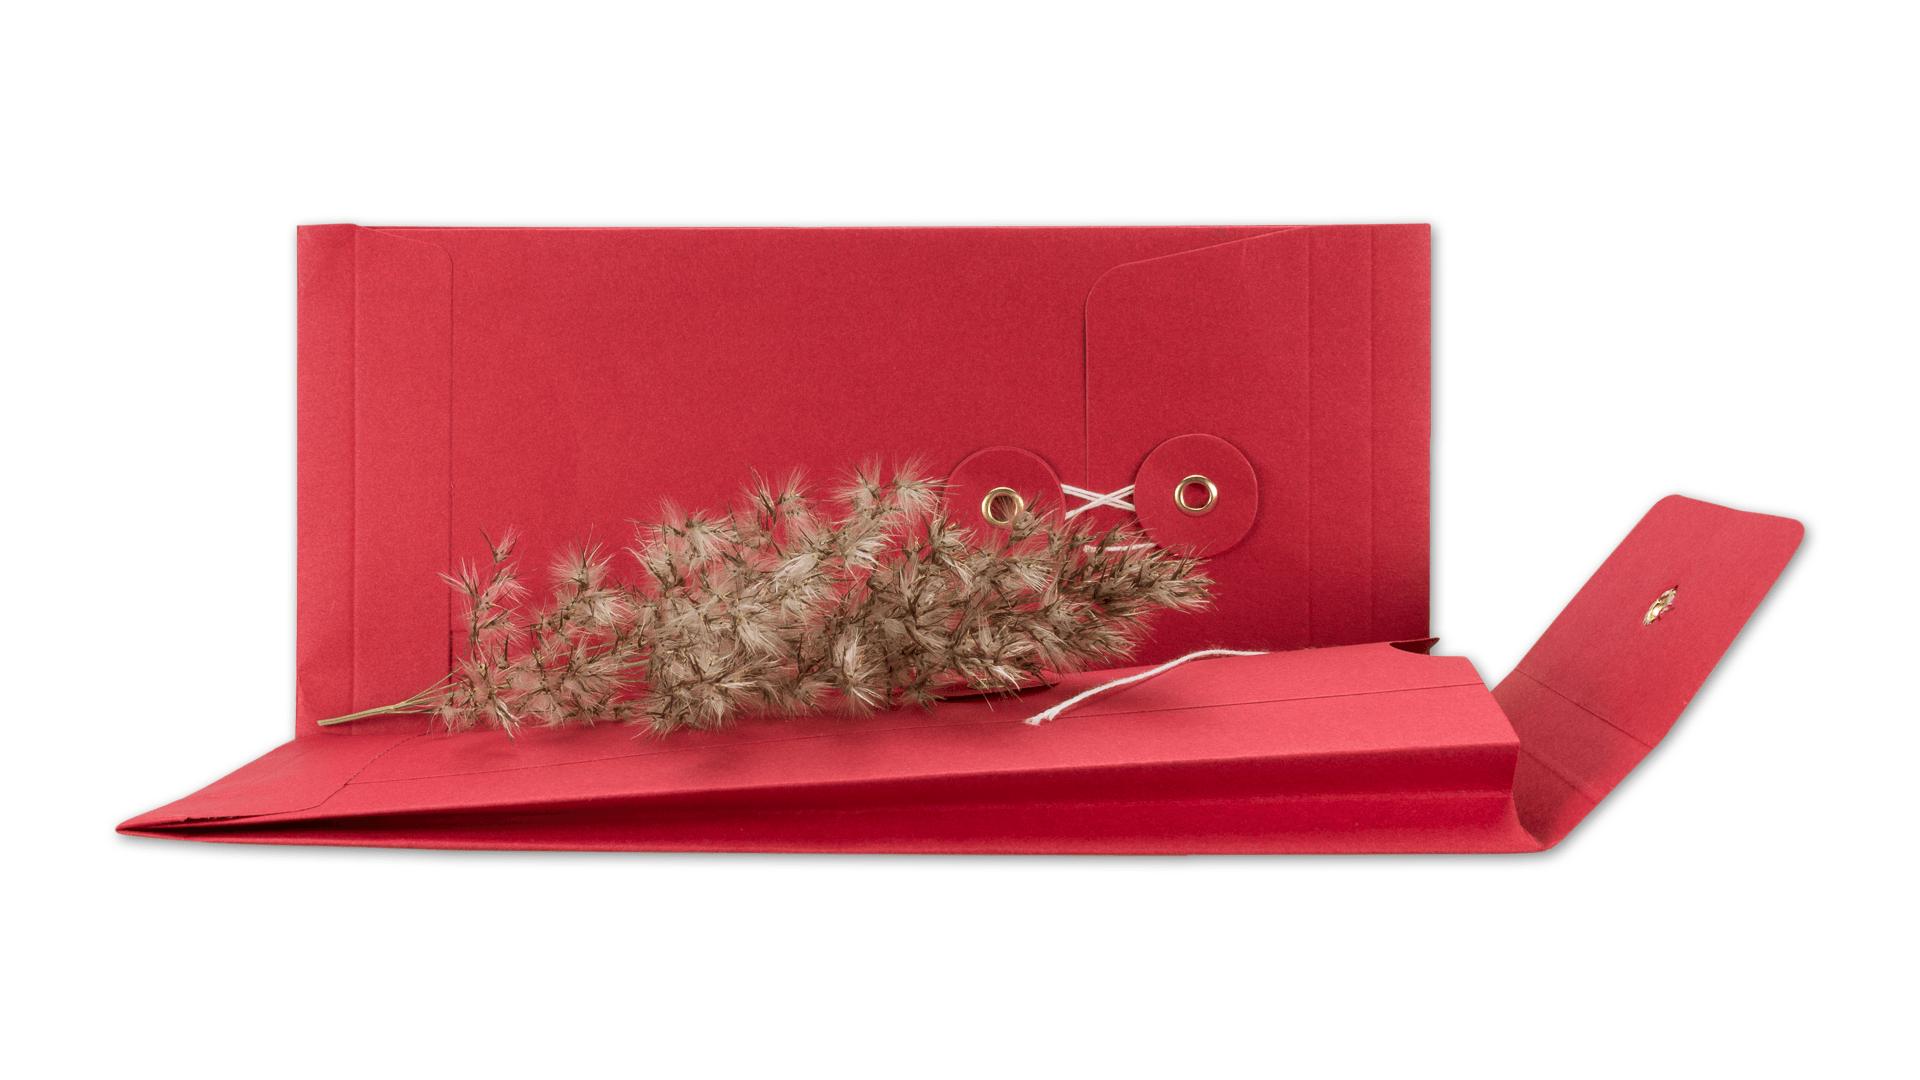 Umschlag Dl Rot 25 Mm Bindfadenverschluss Kraftpapier